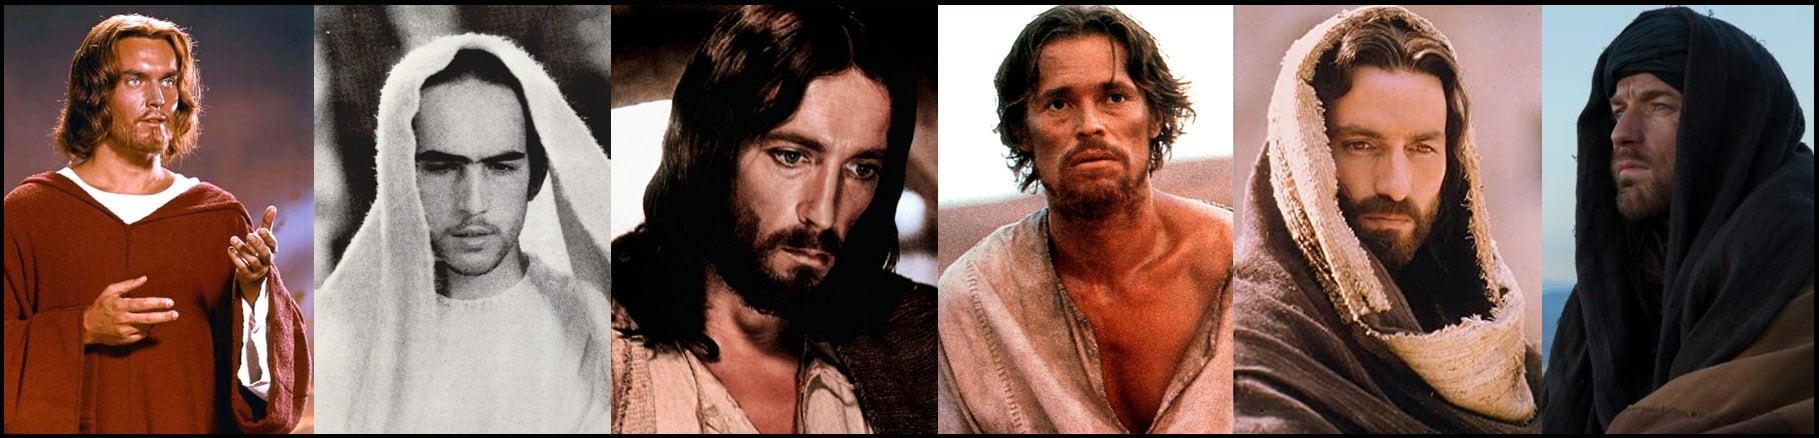 Jesusdarsteller